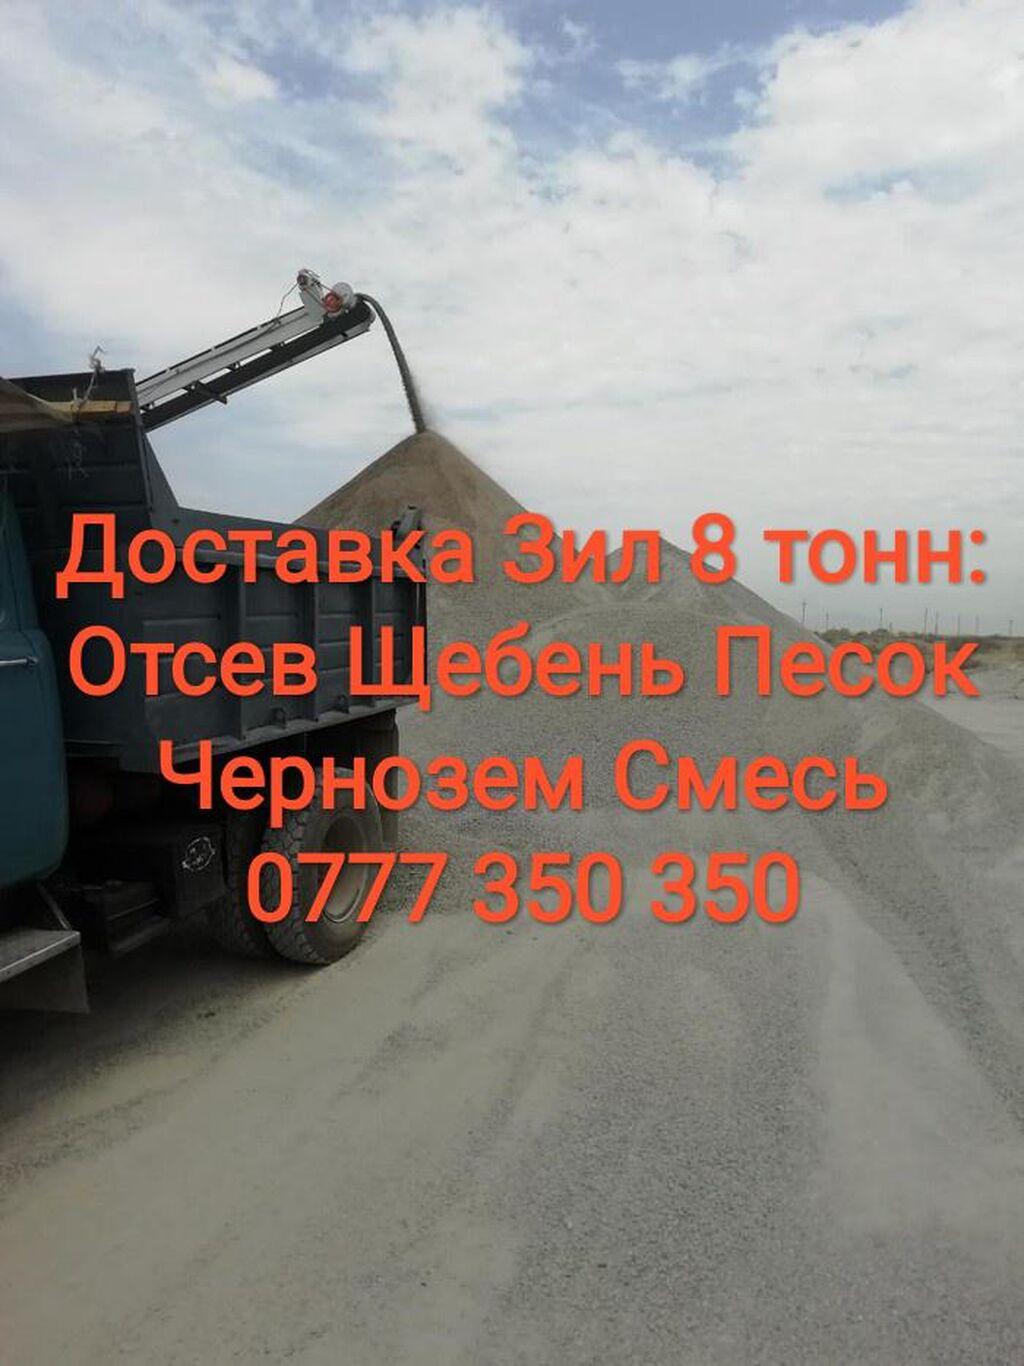 Самосвал По городу | Борт 8 т | Доставка угля, песка, щебня, чернозема